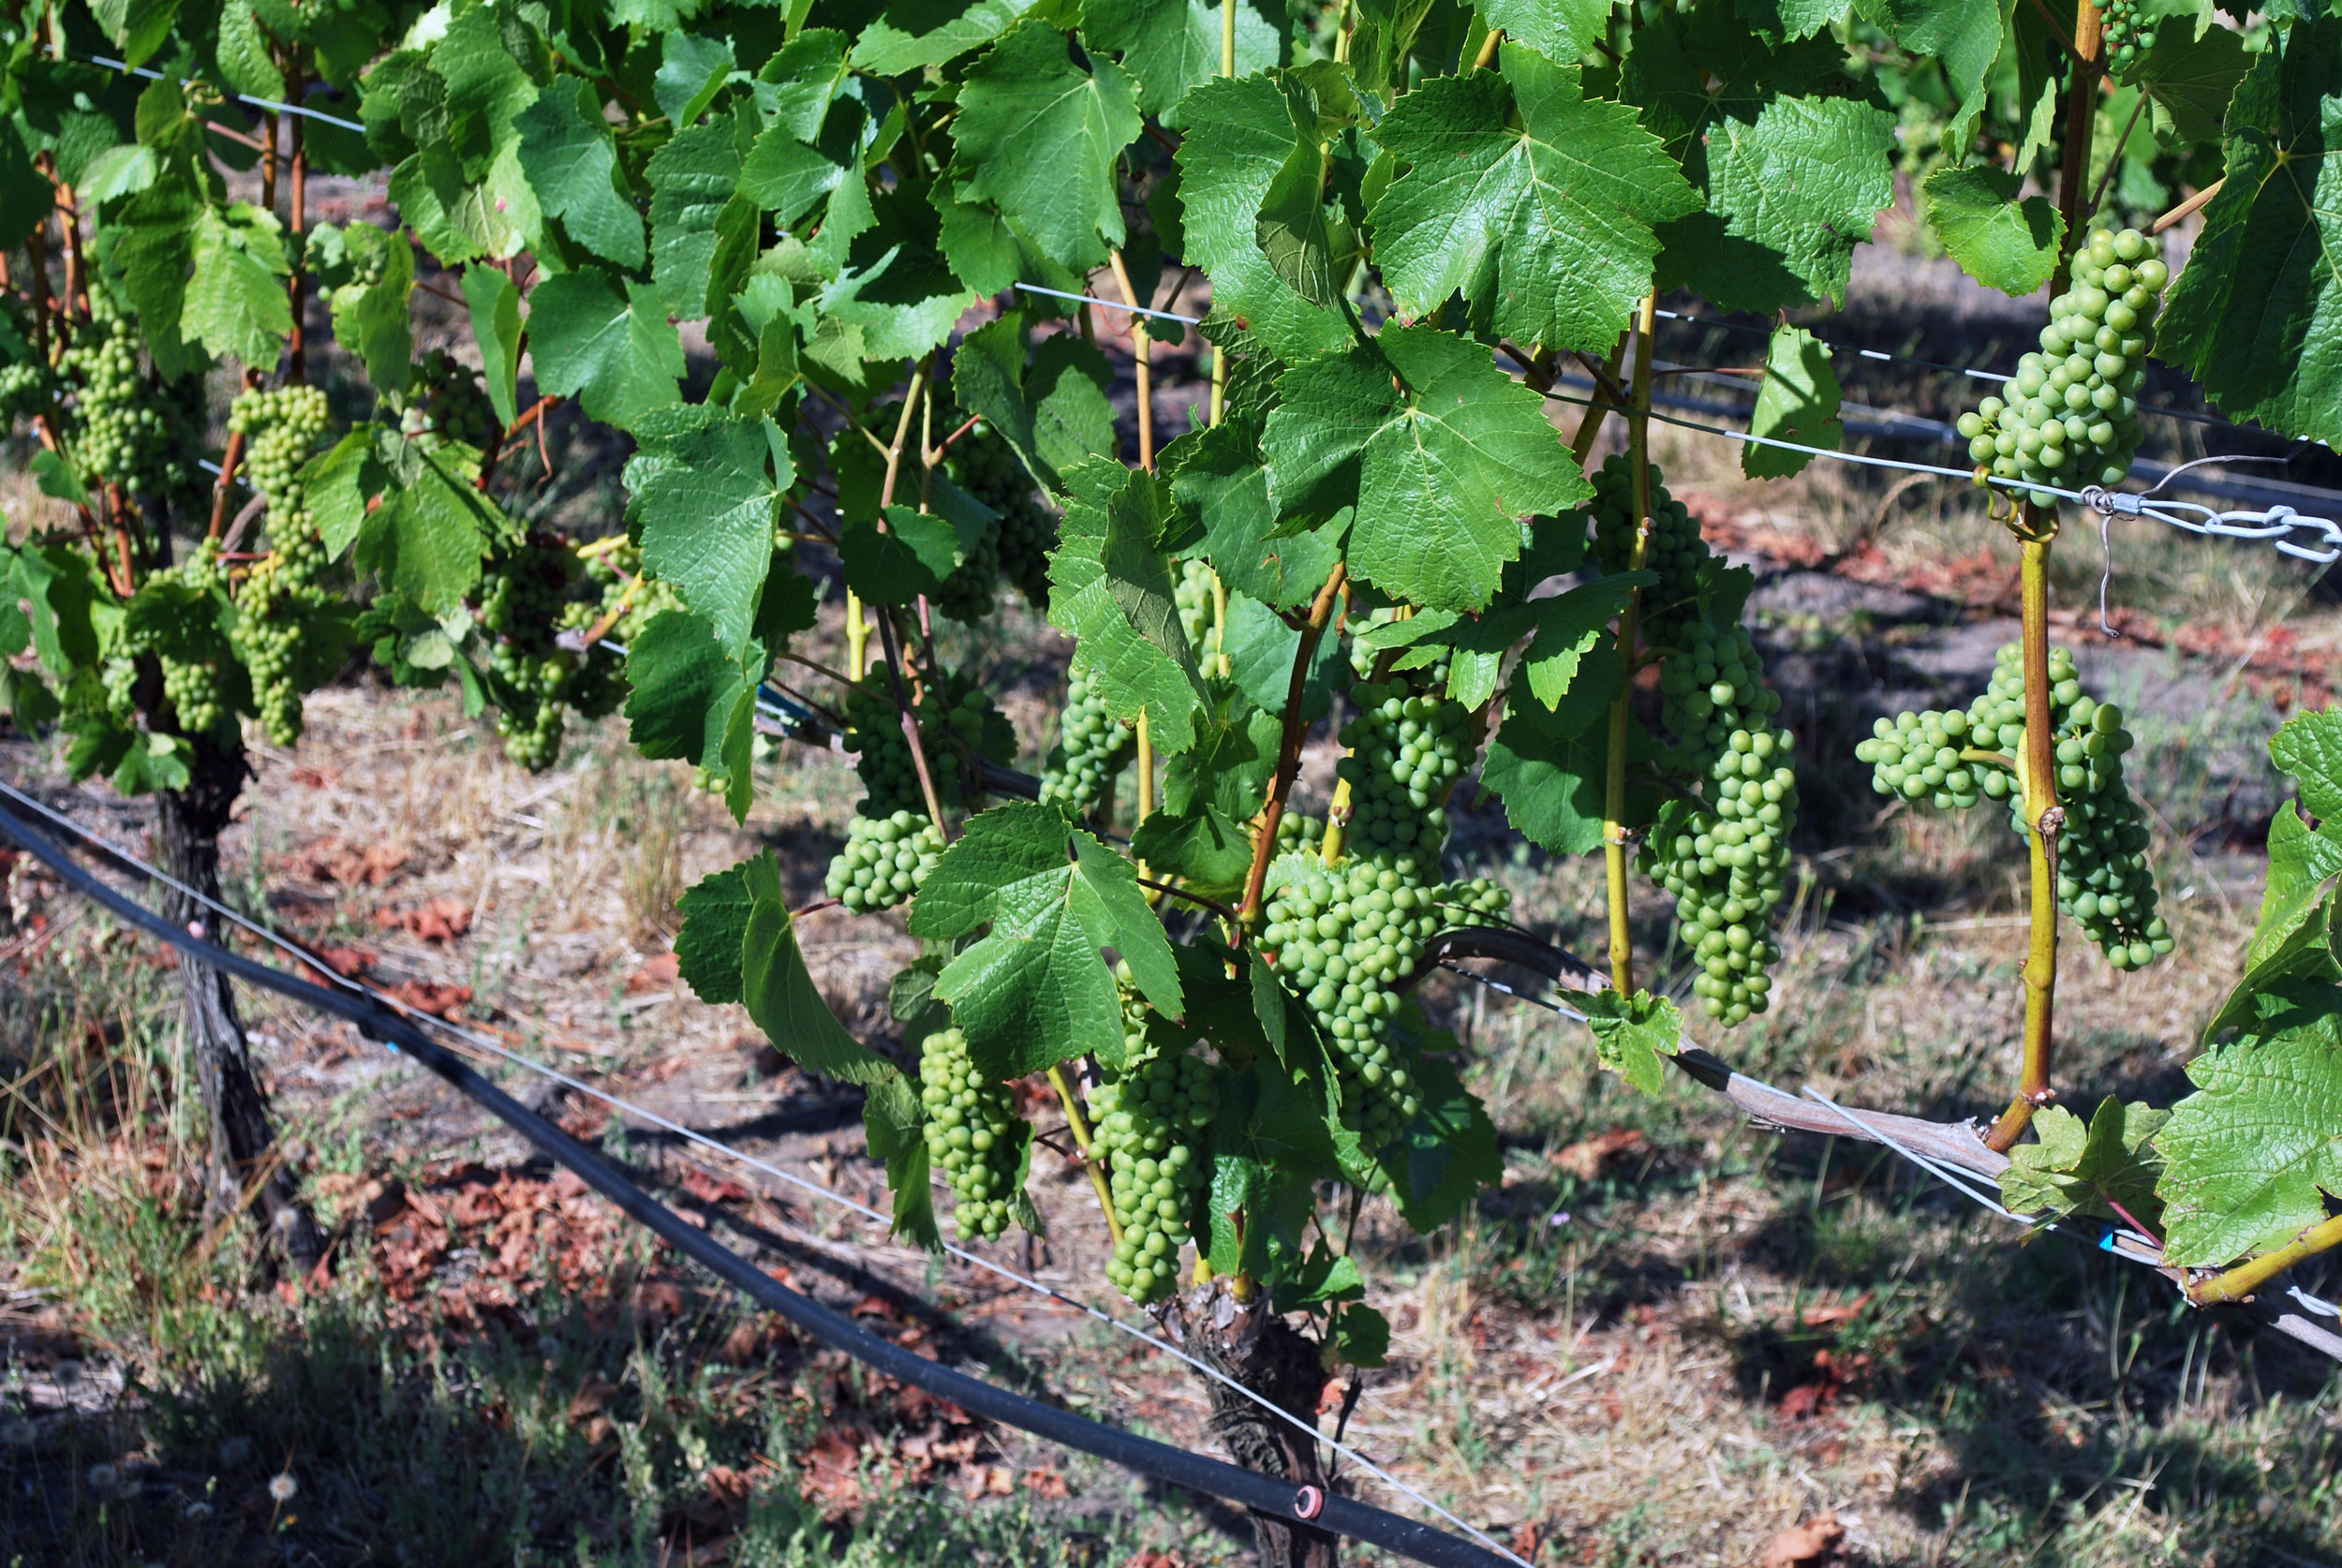 Holmes Gap Vineyard Grapes Aug 2016.jpg